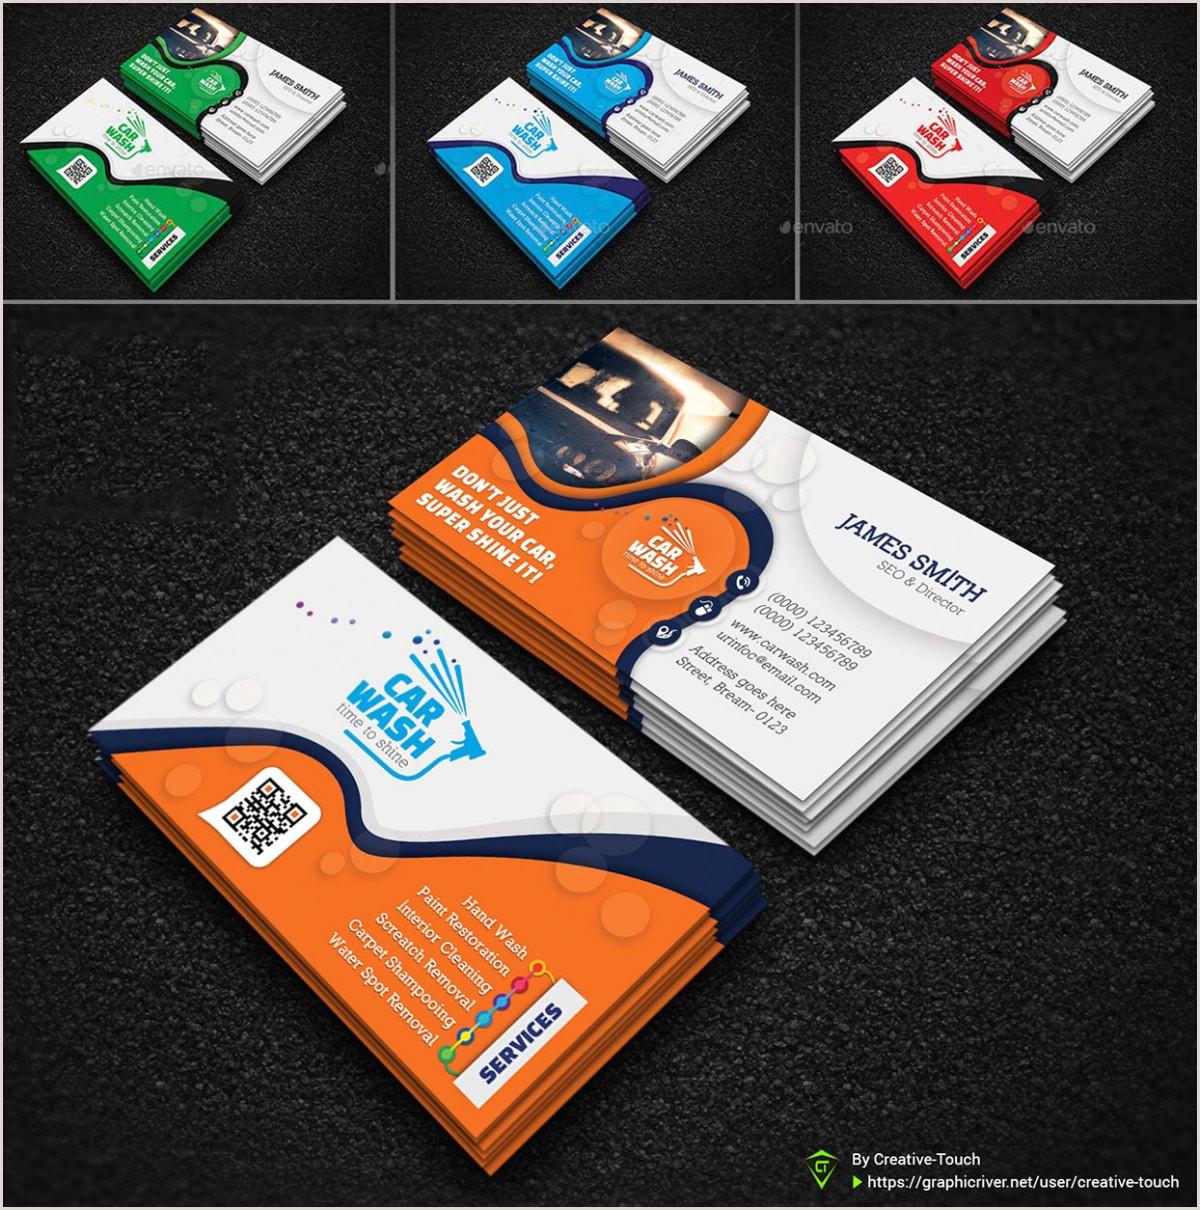 Car Wash Best Business Cards 10 Best Editable Car Wash Business Card Templates 2020